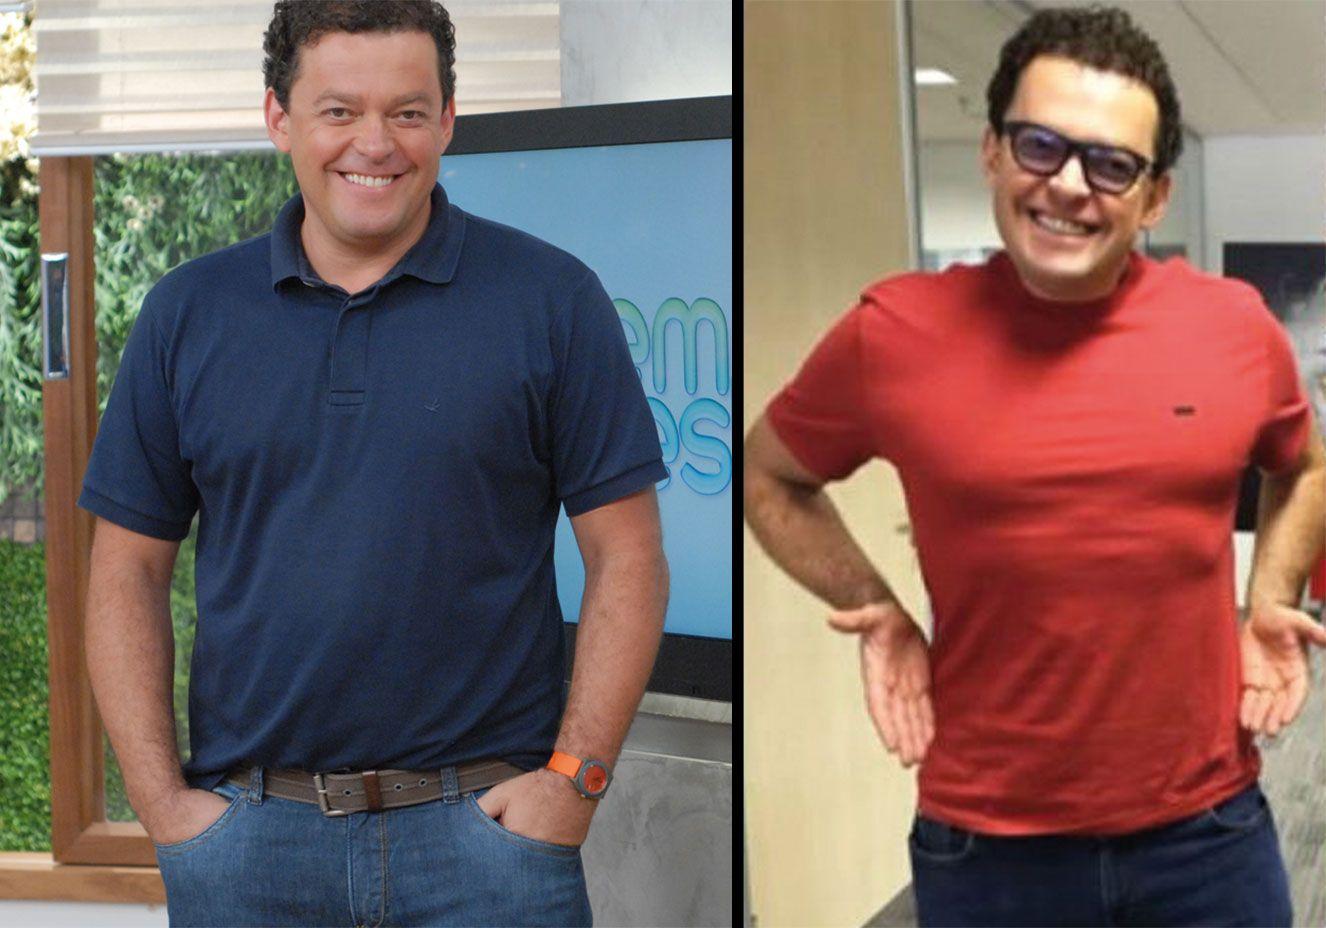 5 Duvidas Sobre A Dieta Que Fez Fernando Rocha Perder 20 Quilos